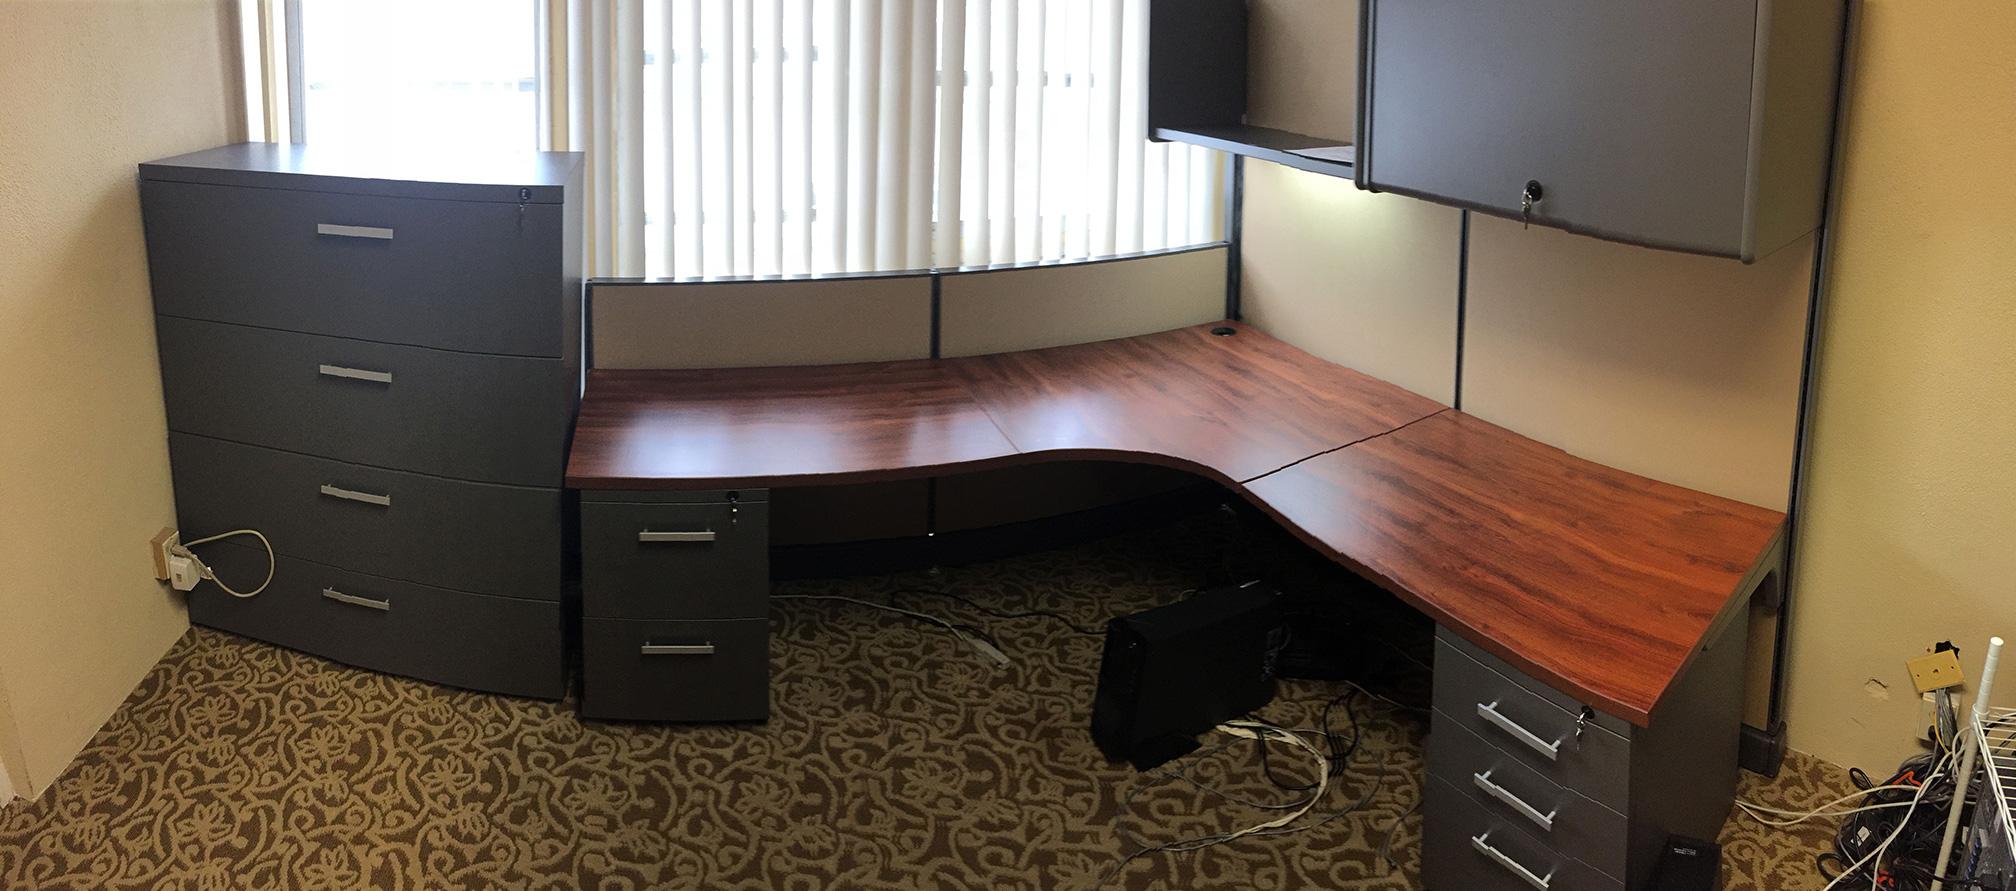 office-cubicles-for-sale-in-eustis-florida-3-2.jpg